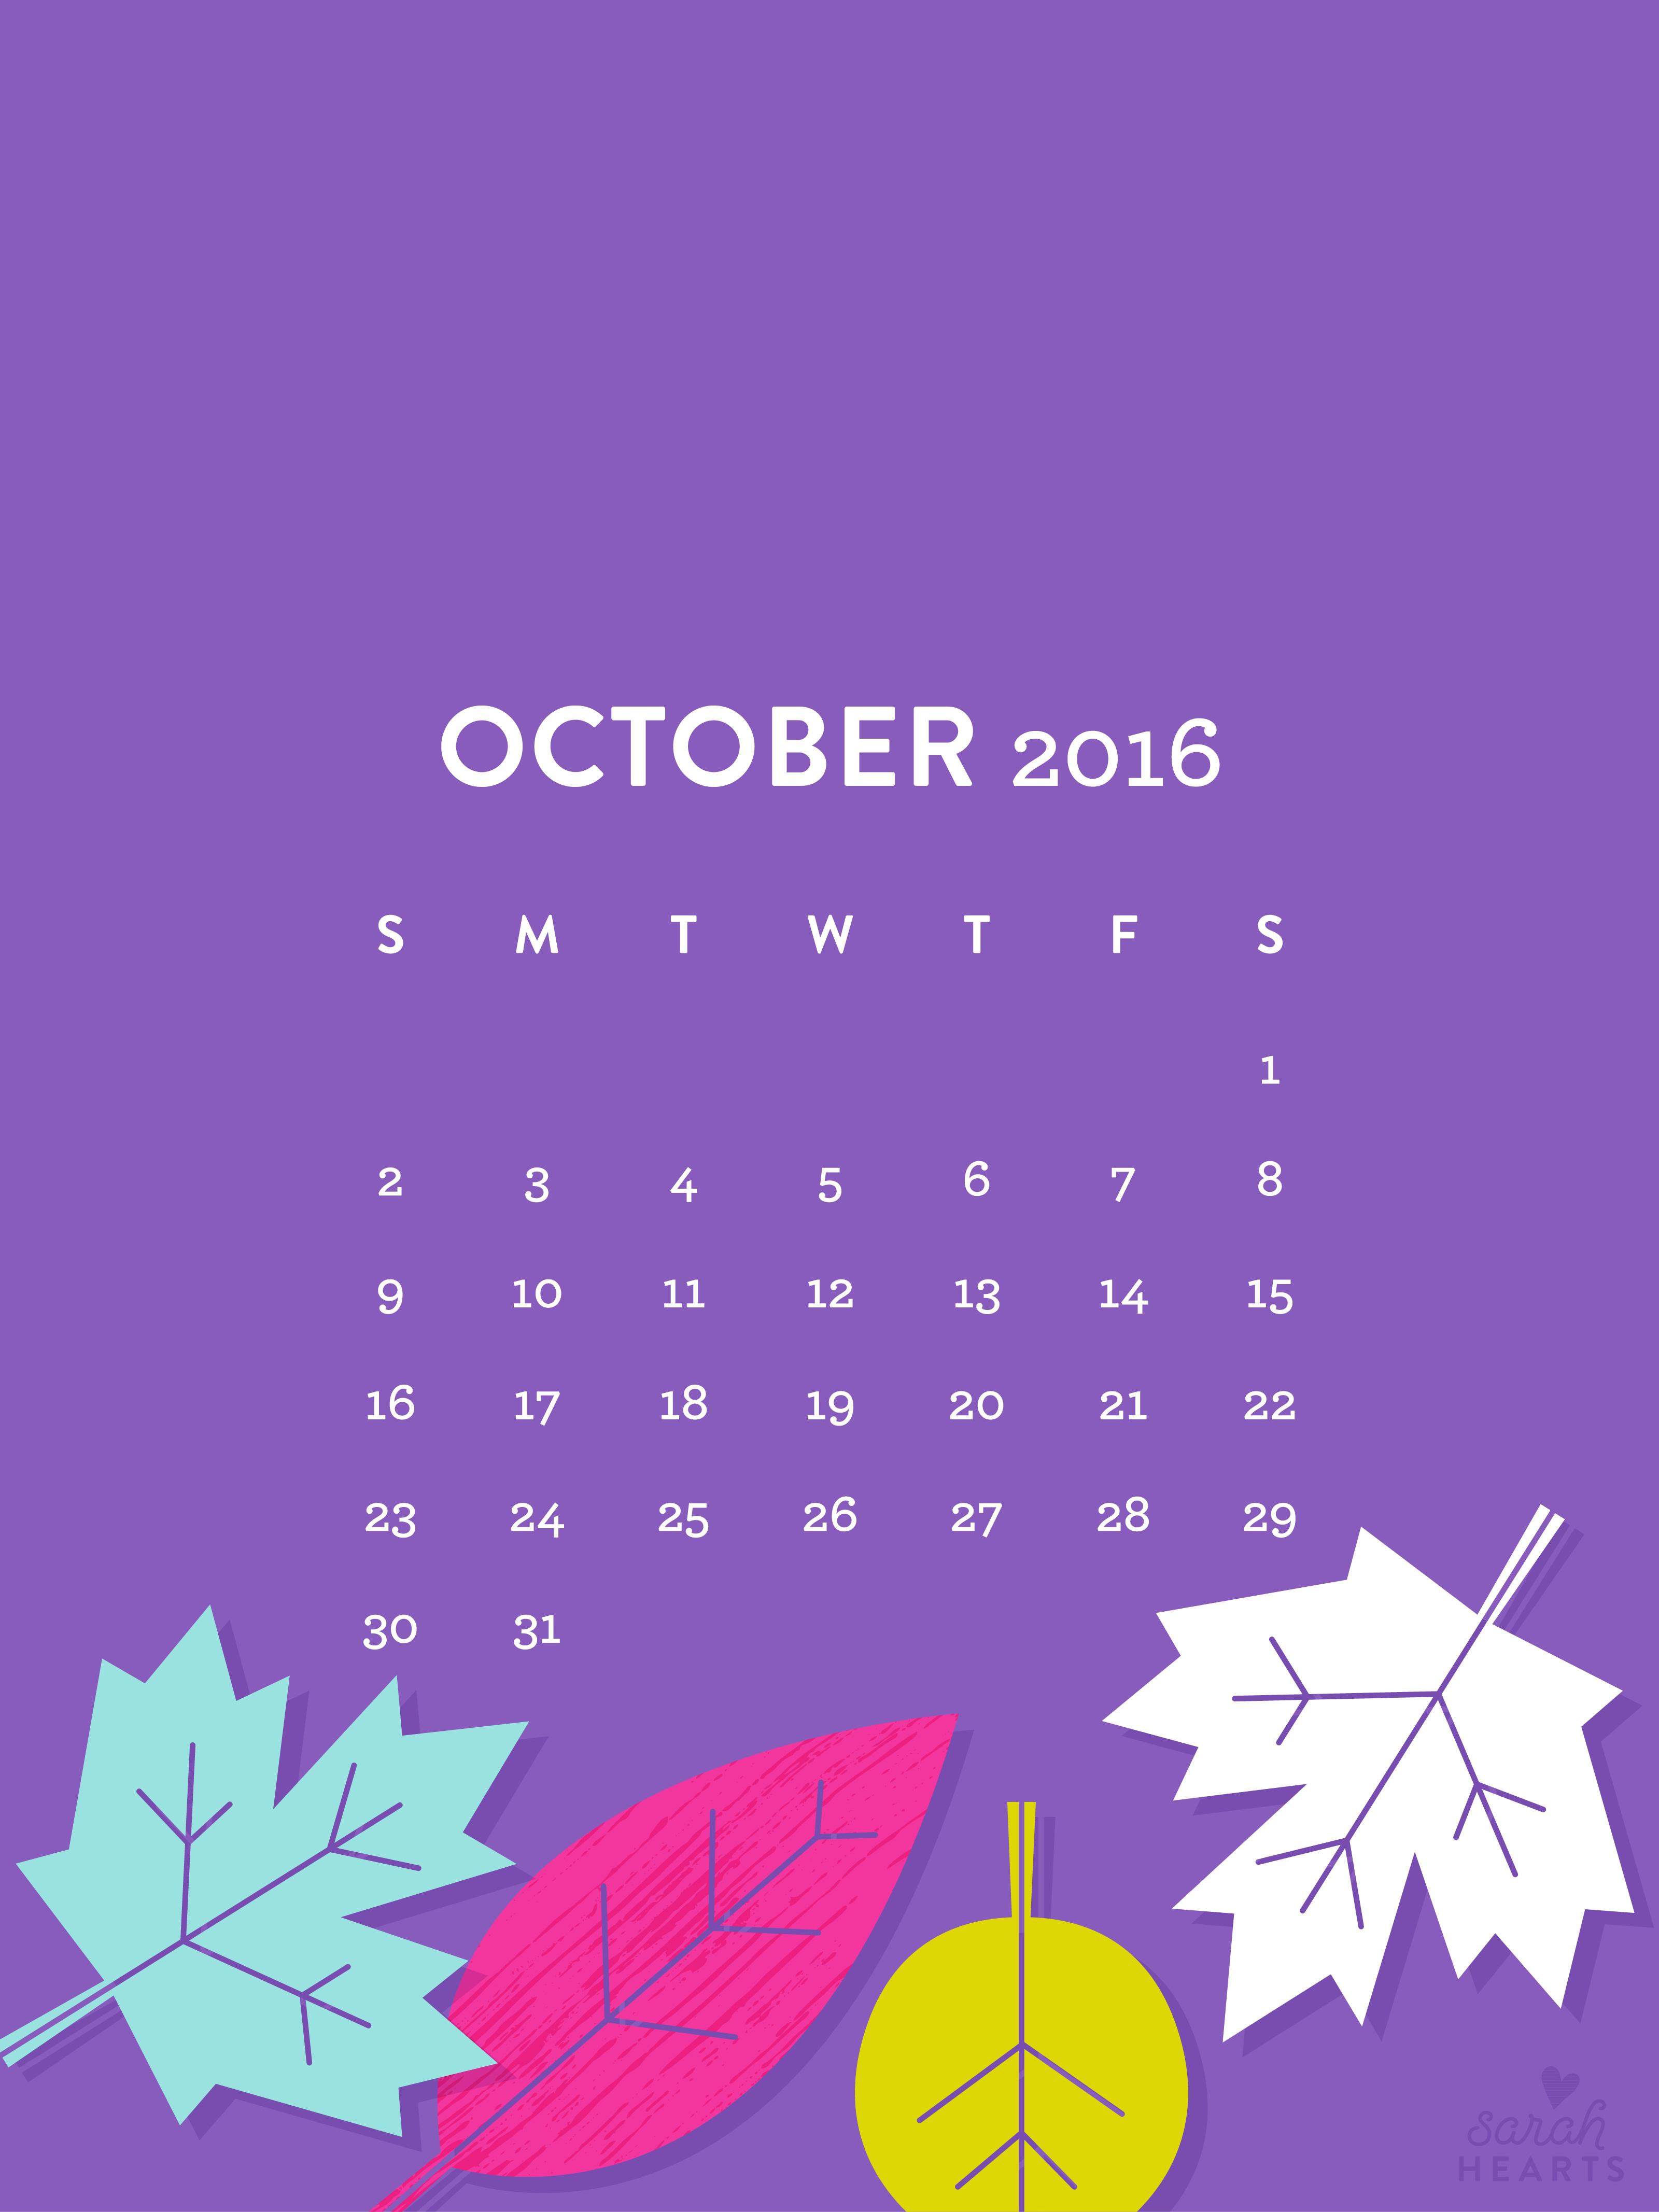 Fall Colors Computer Wallpaper October 2016 Fall Leaves Calendar Wallpapers Sarah Hearts